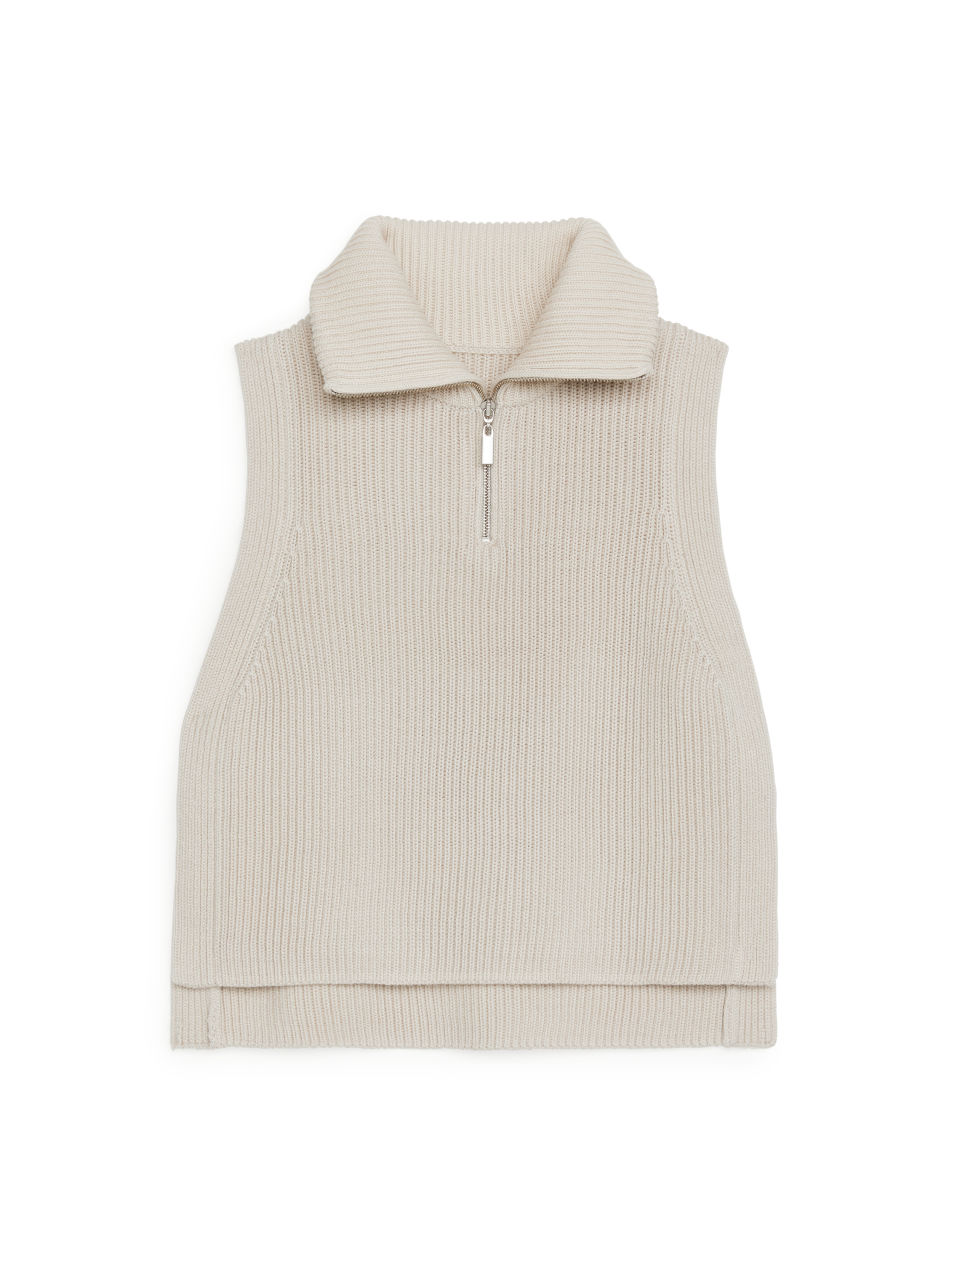 Half-Zip Wool Blend Bib - Beige